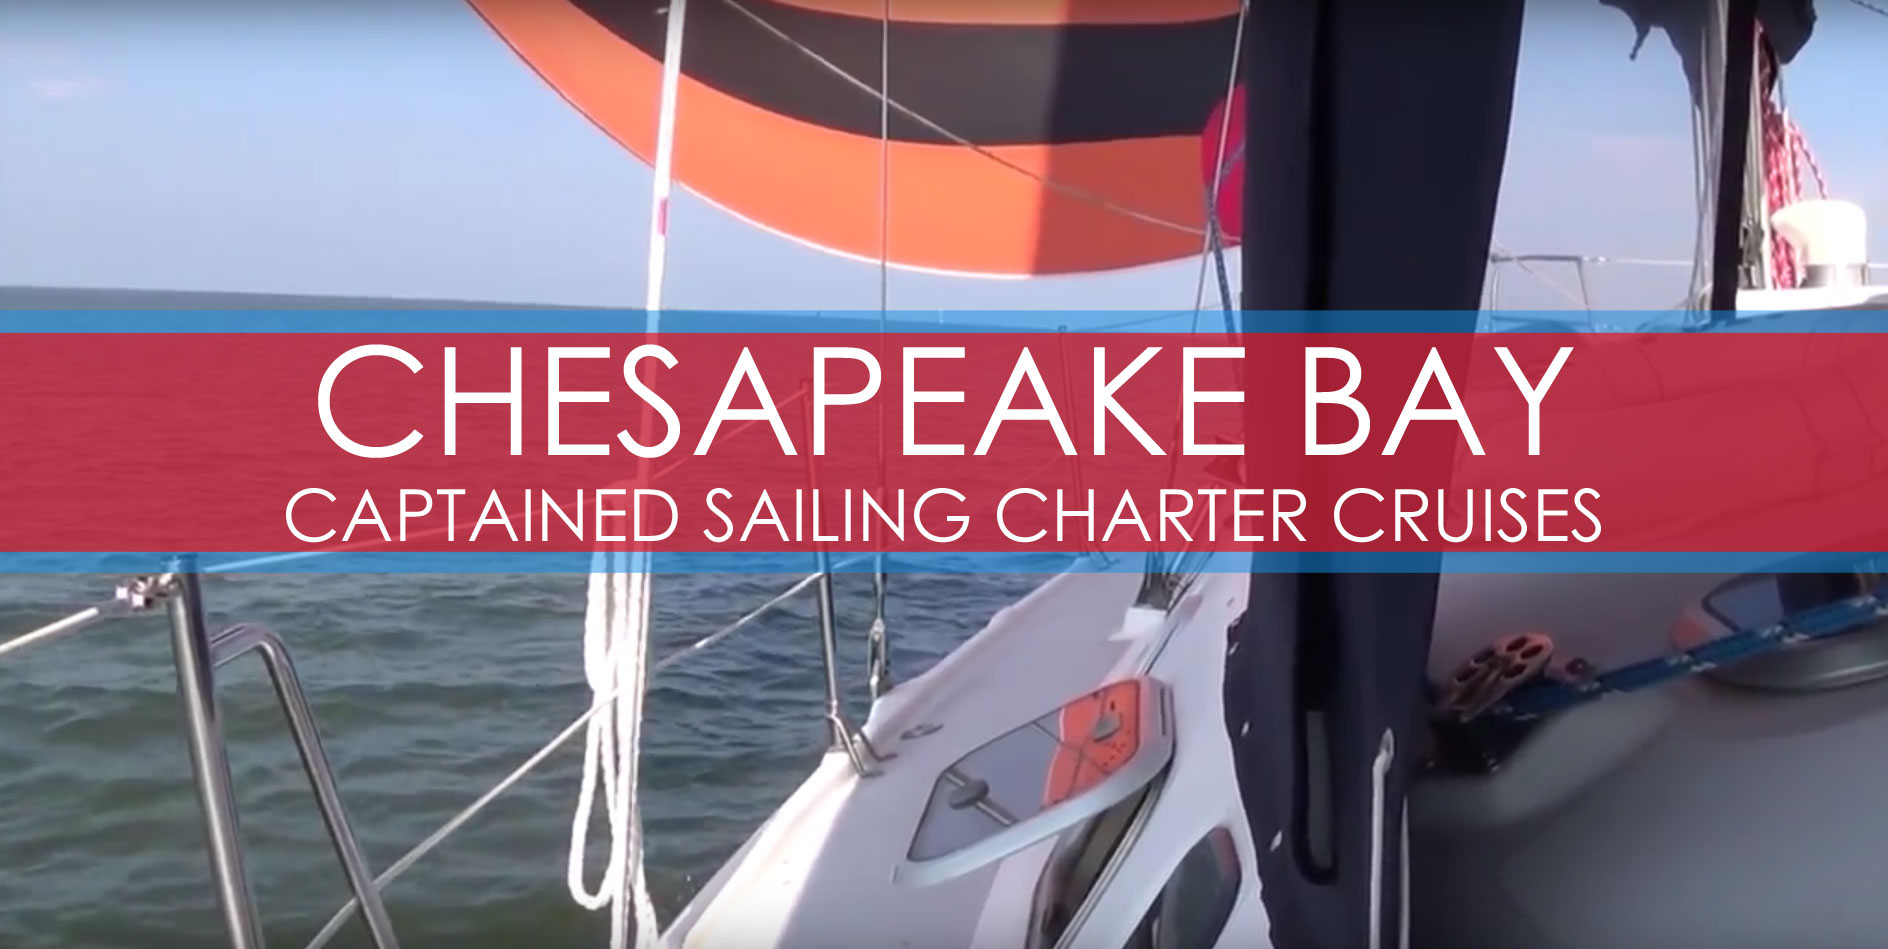 Chesapeake Bay Sailing Charters